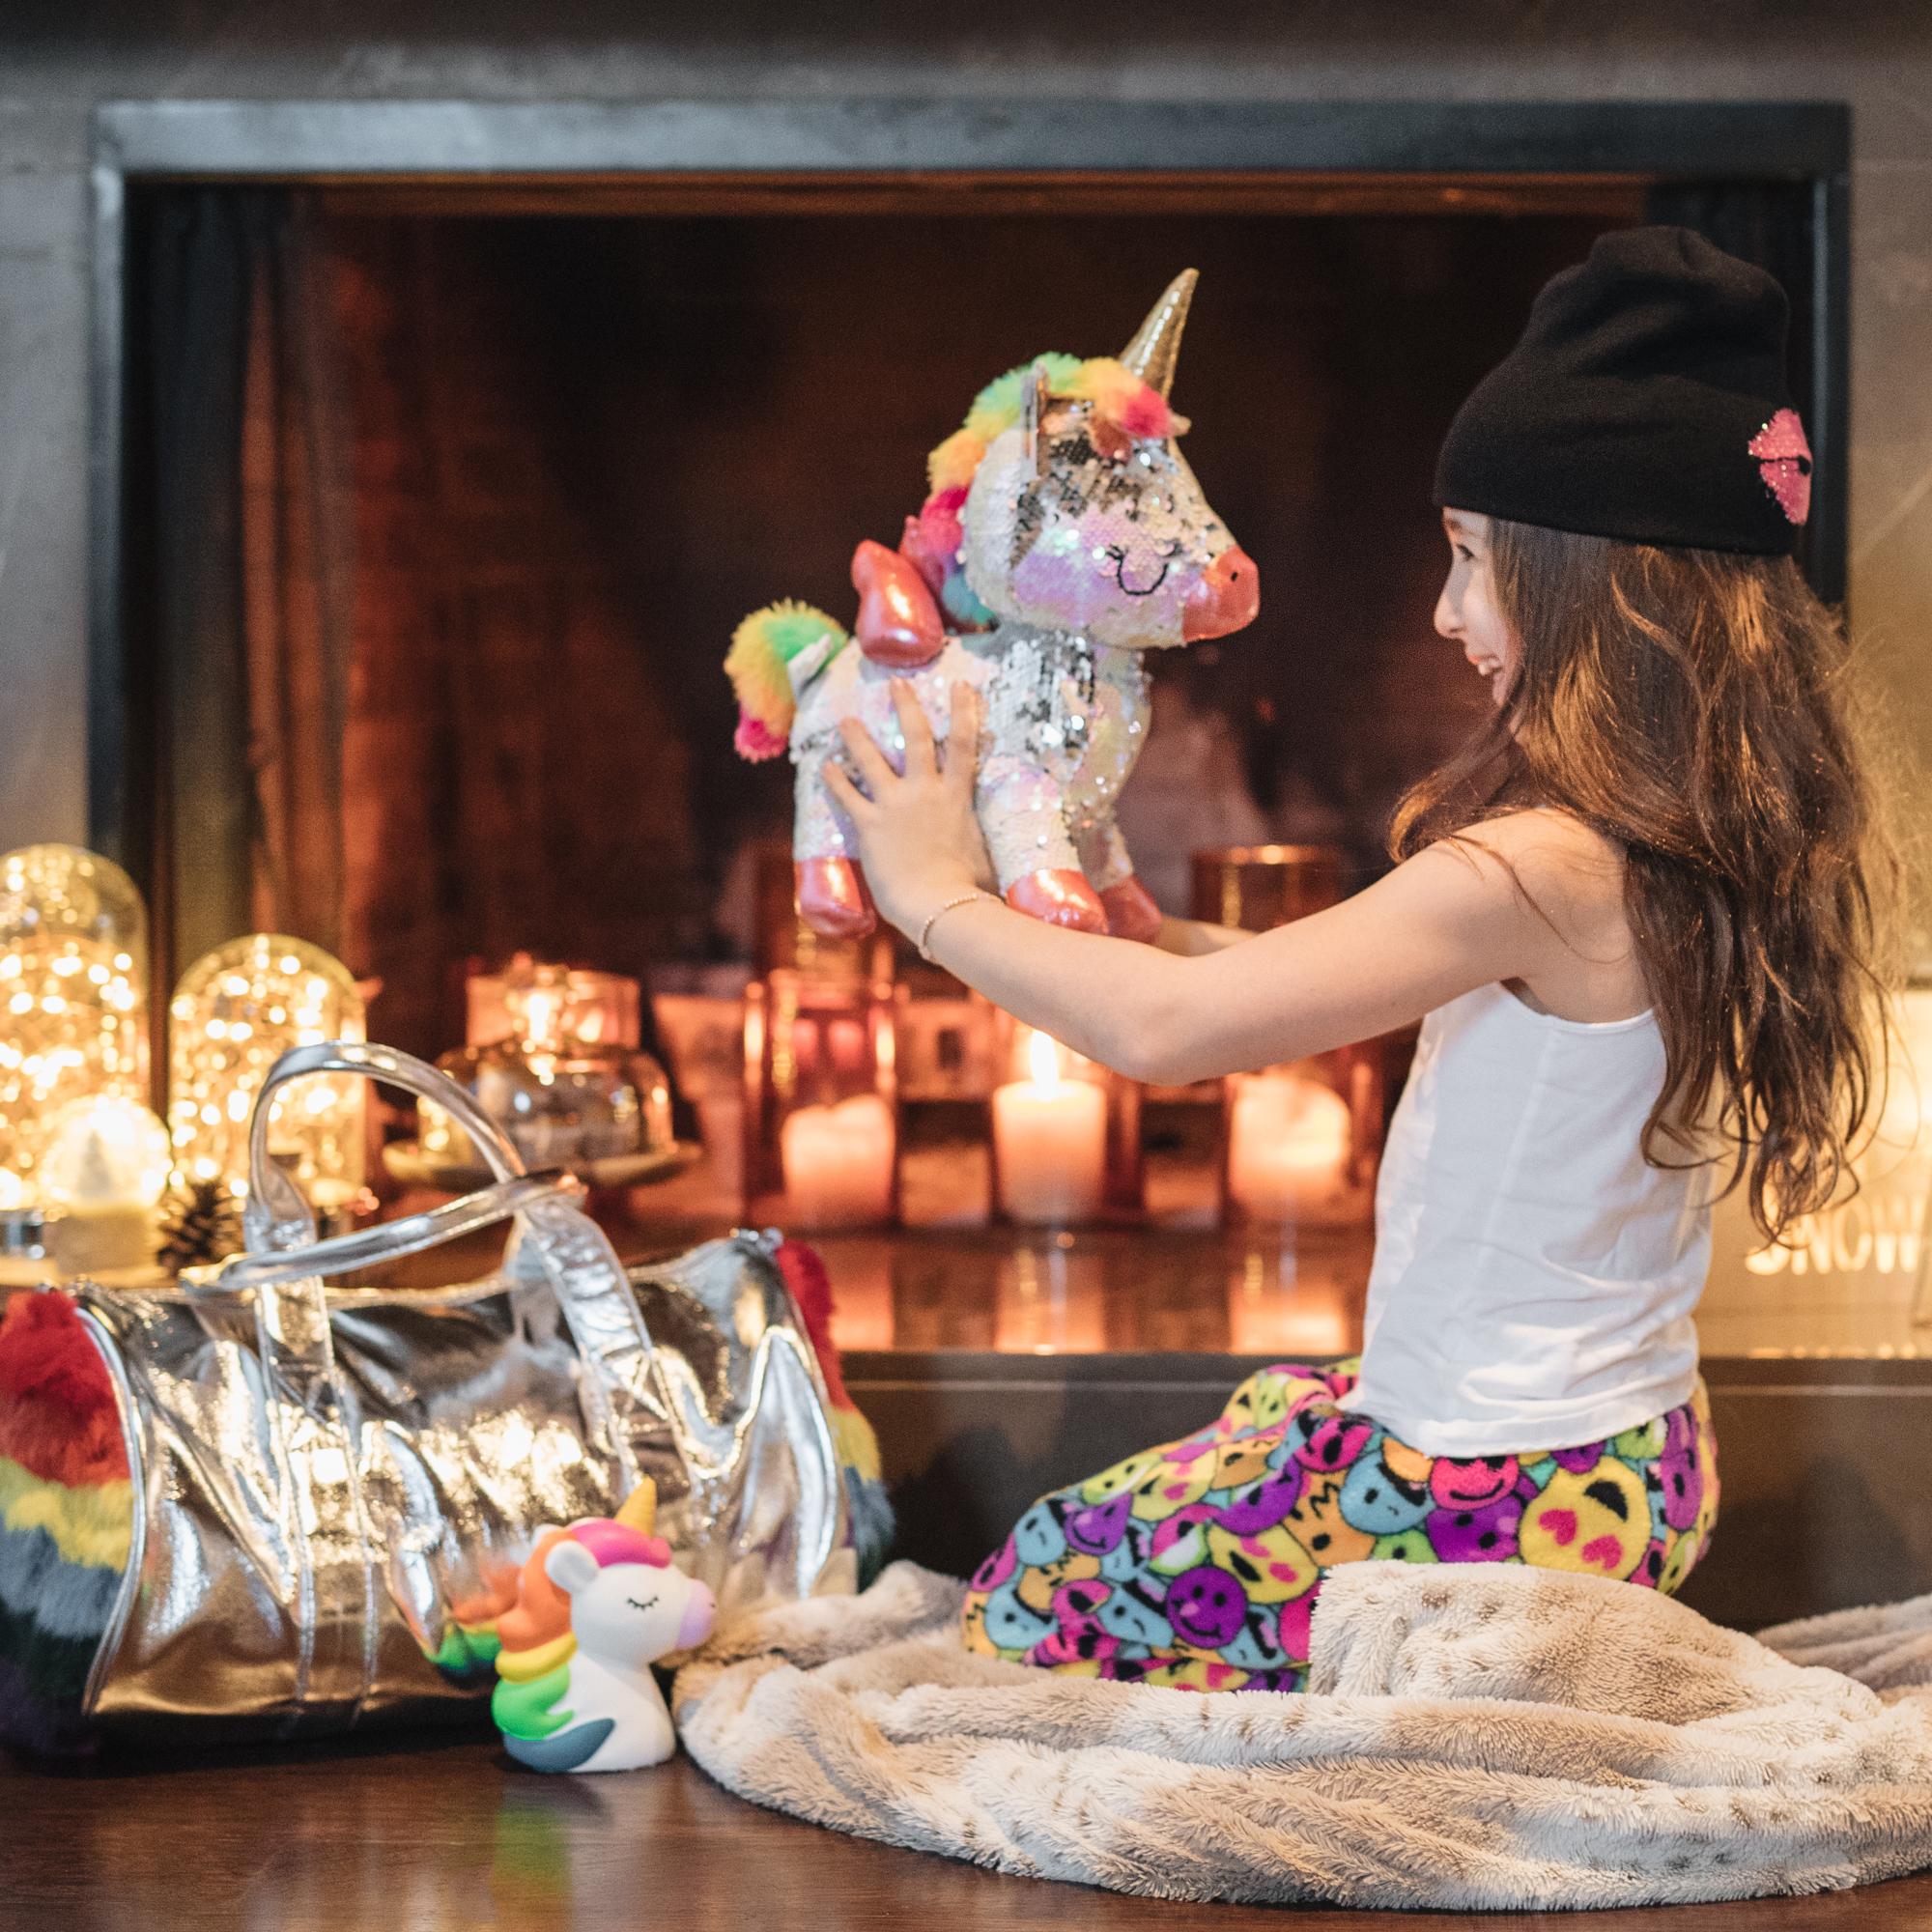 Unicorns - For the unicorn lovers